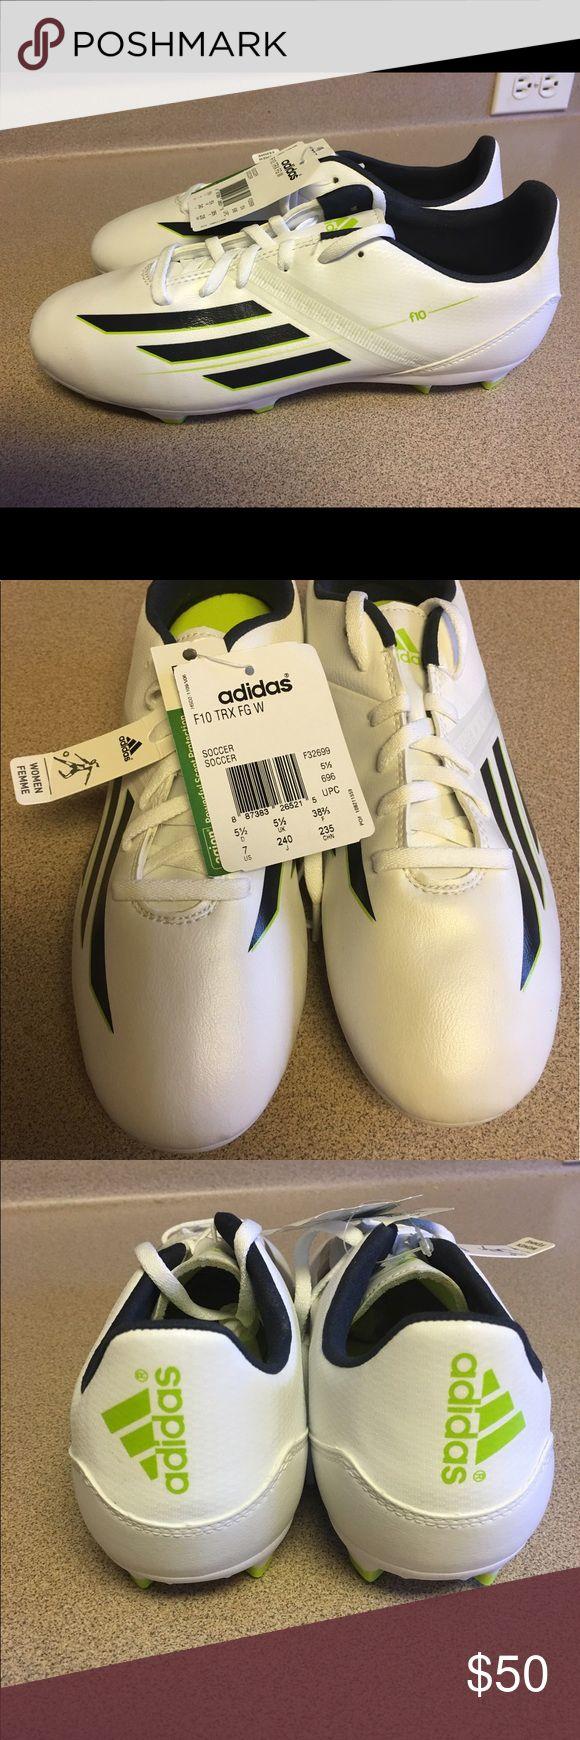 NEW NET WOMENS ADIDAS F10 TRX FG W SOCCER Size 7M NEW NET WOMENS ADIDAS F10 TRX FG W SOCCER SHOES Size 7 M Adidas Shoes Athletic Shoes